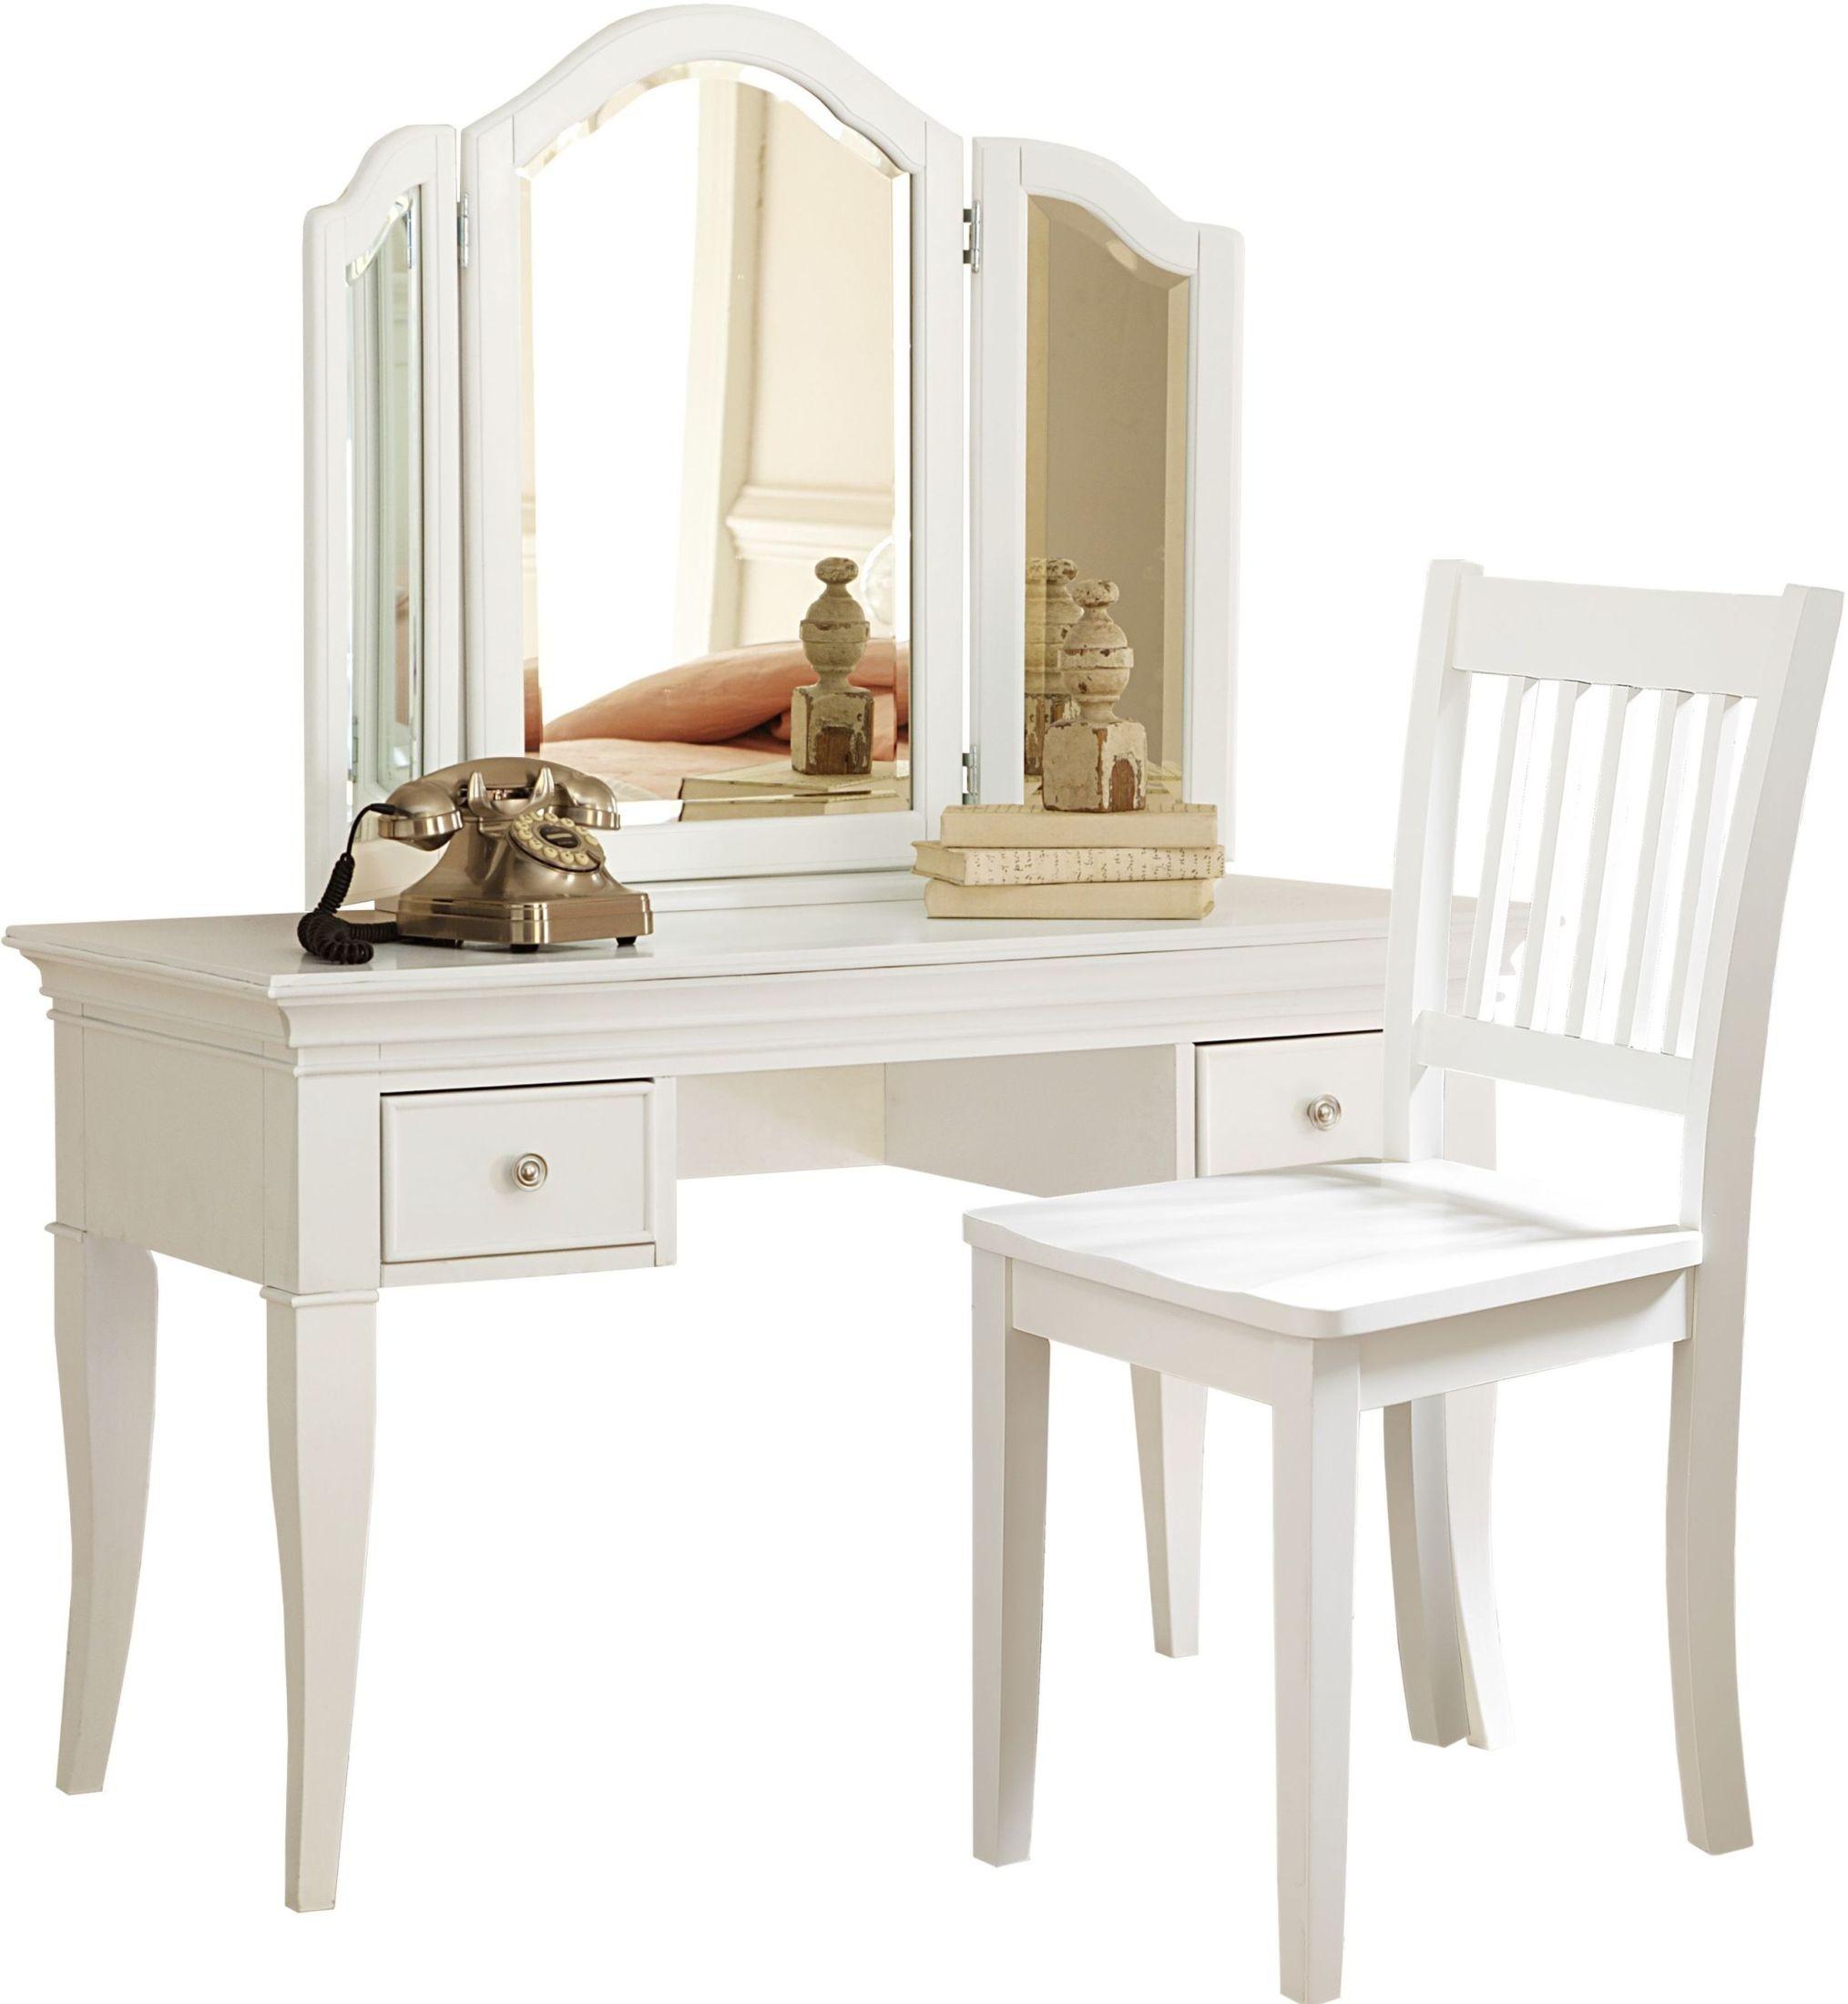 Walnut Street White Desk And Storage Vanity With Mirror